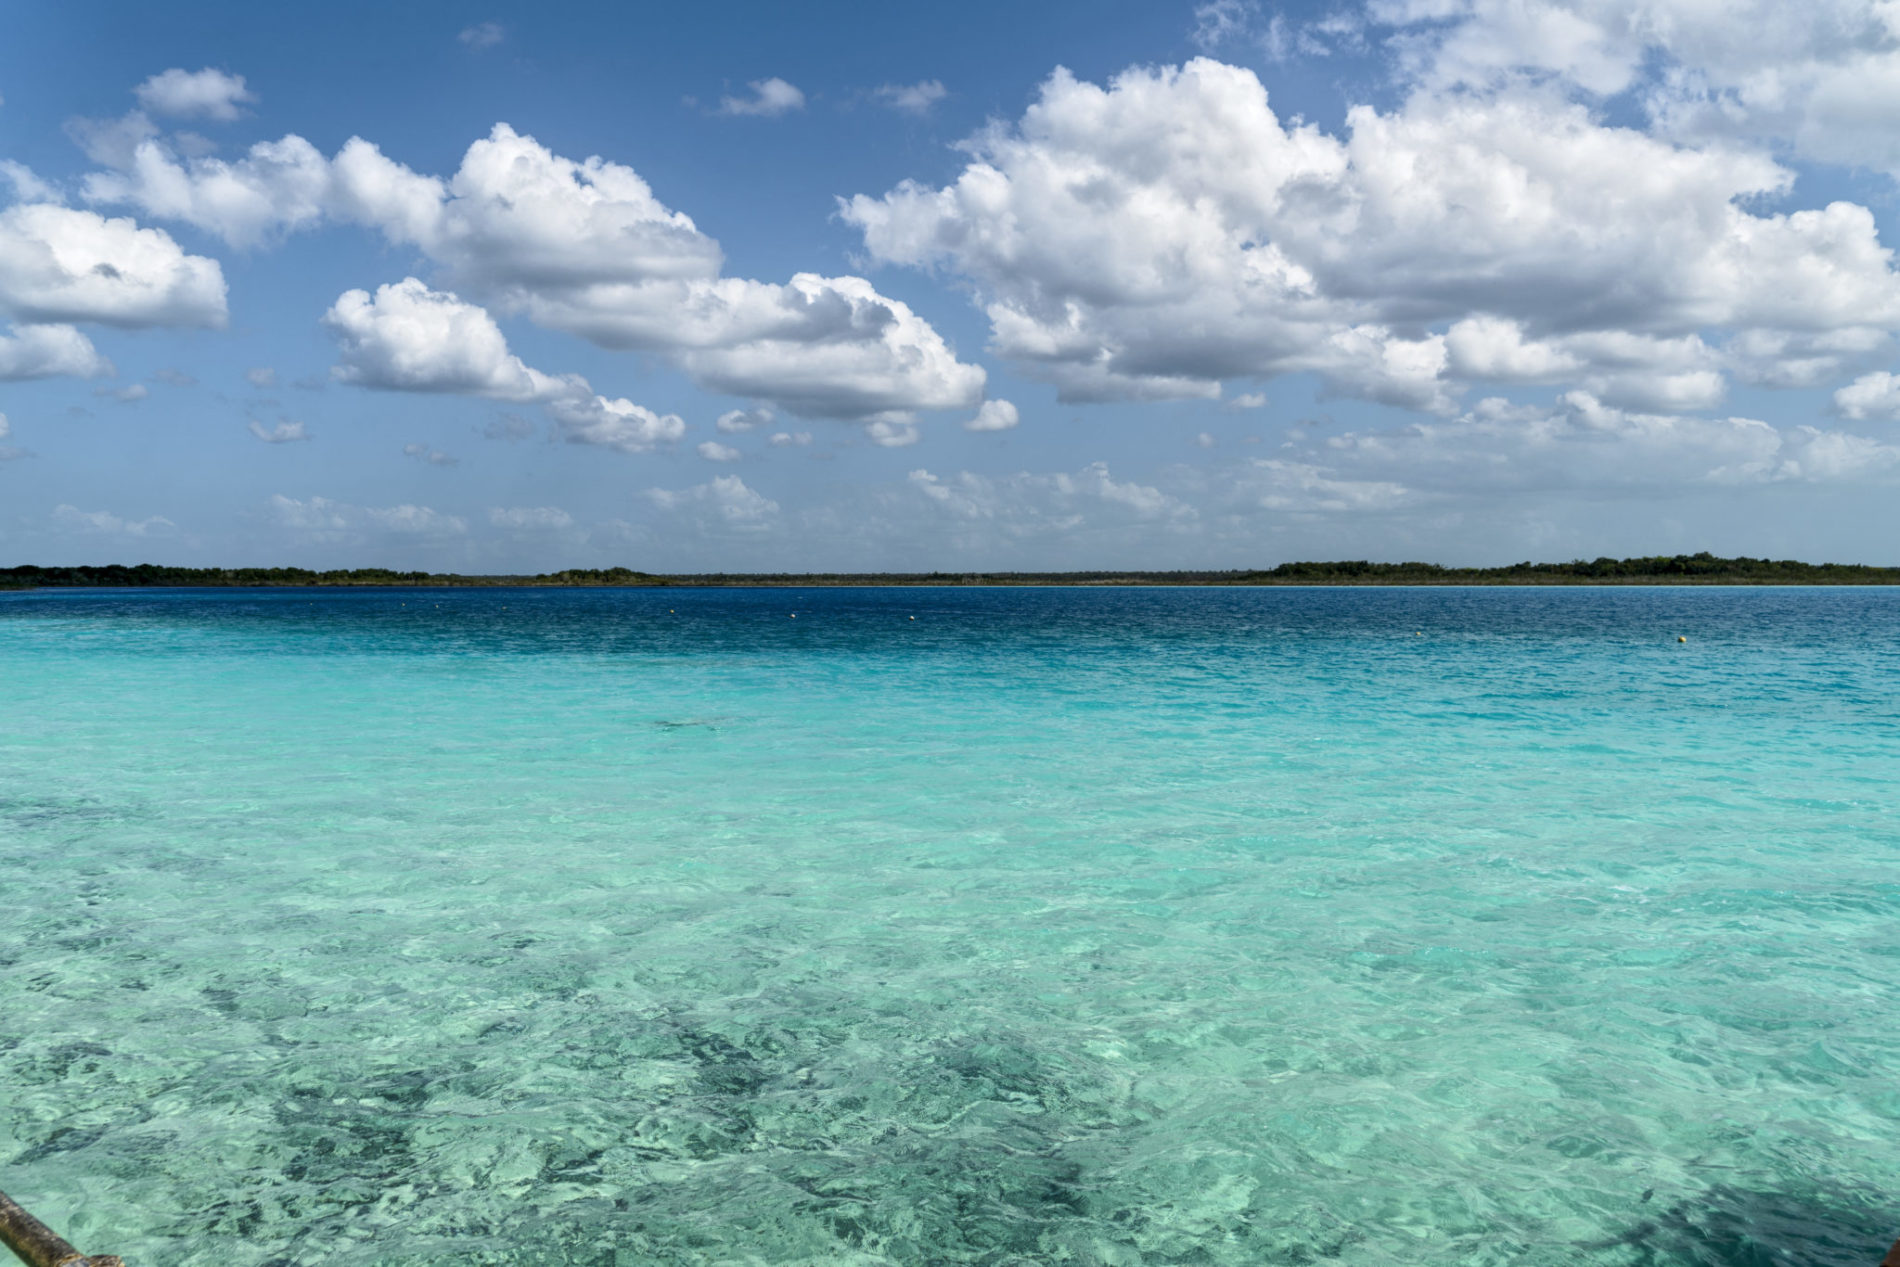 lagune-de-bacalar-eau-cristalline-yucatan